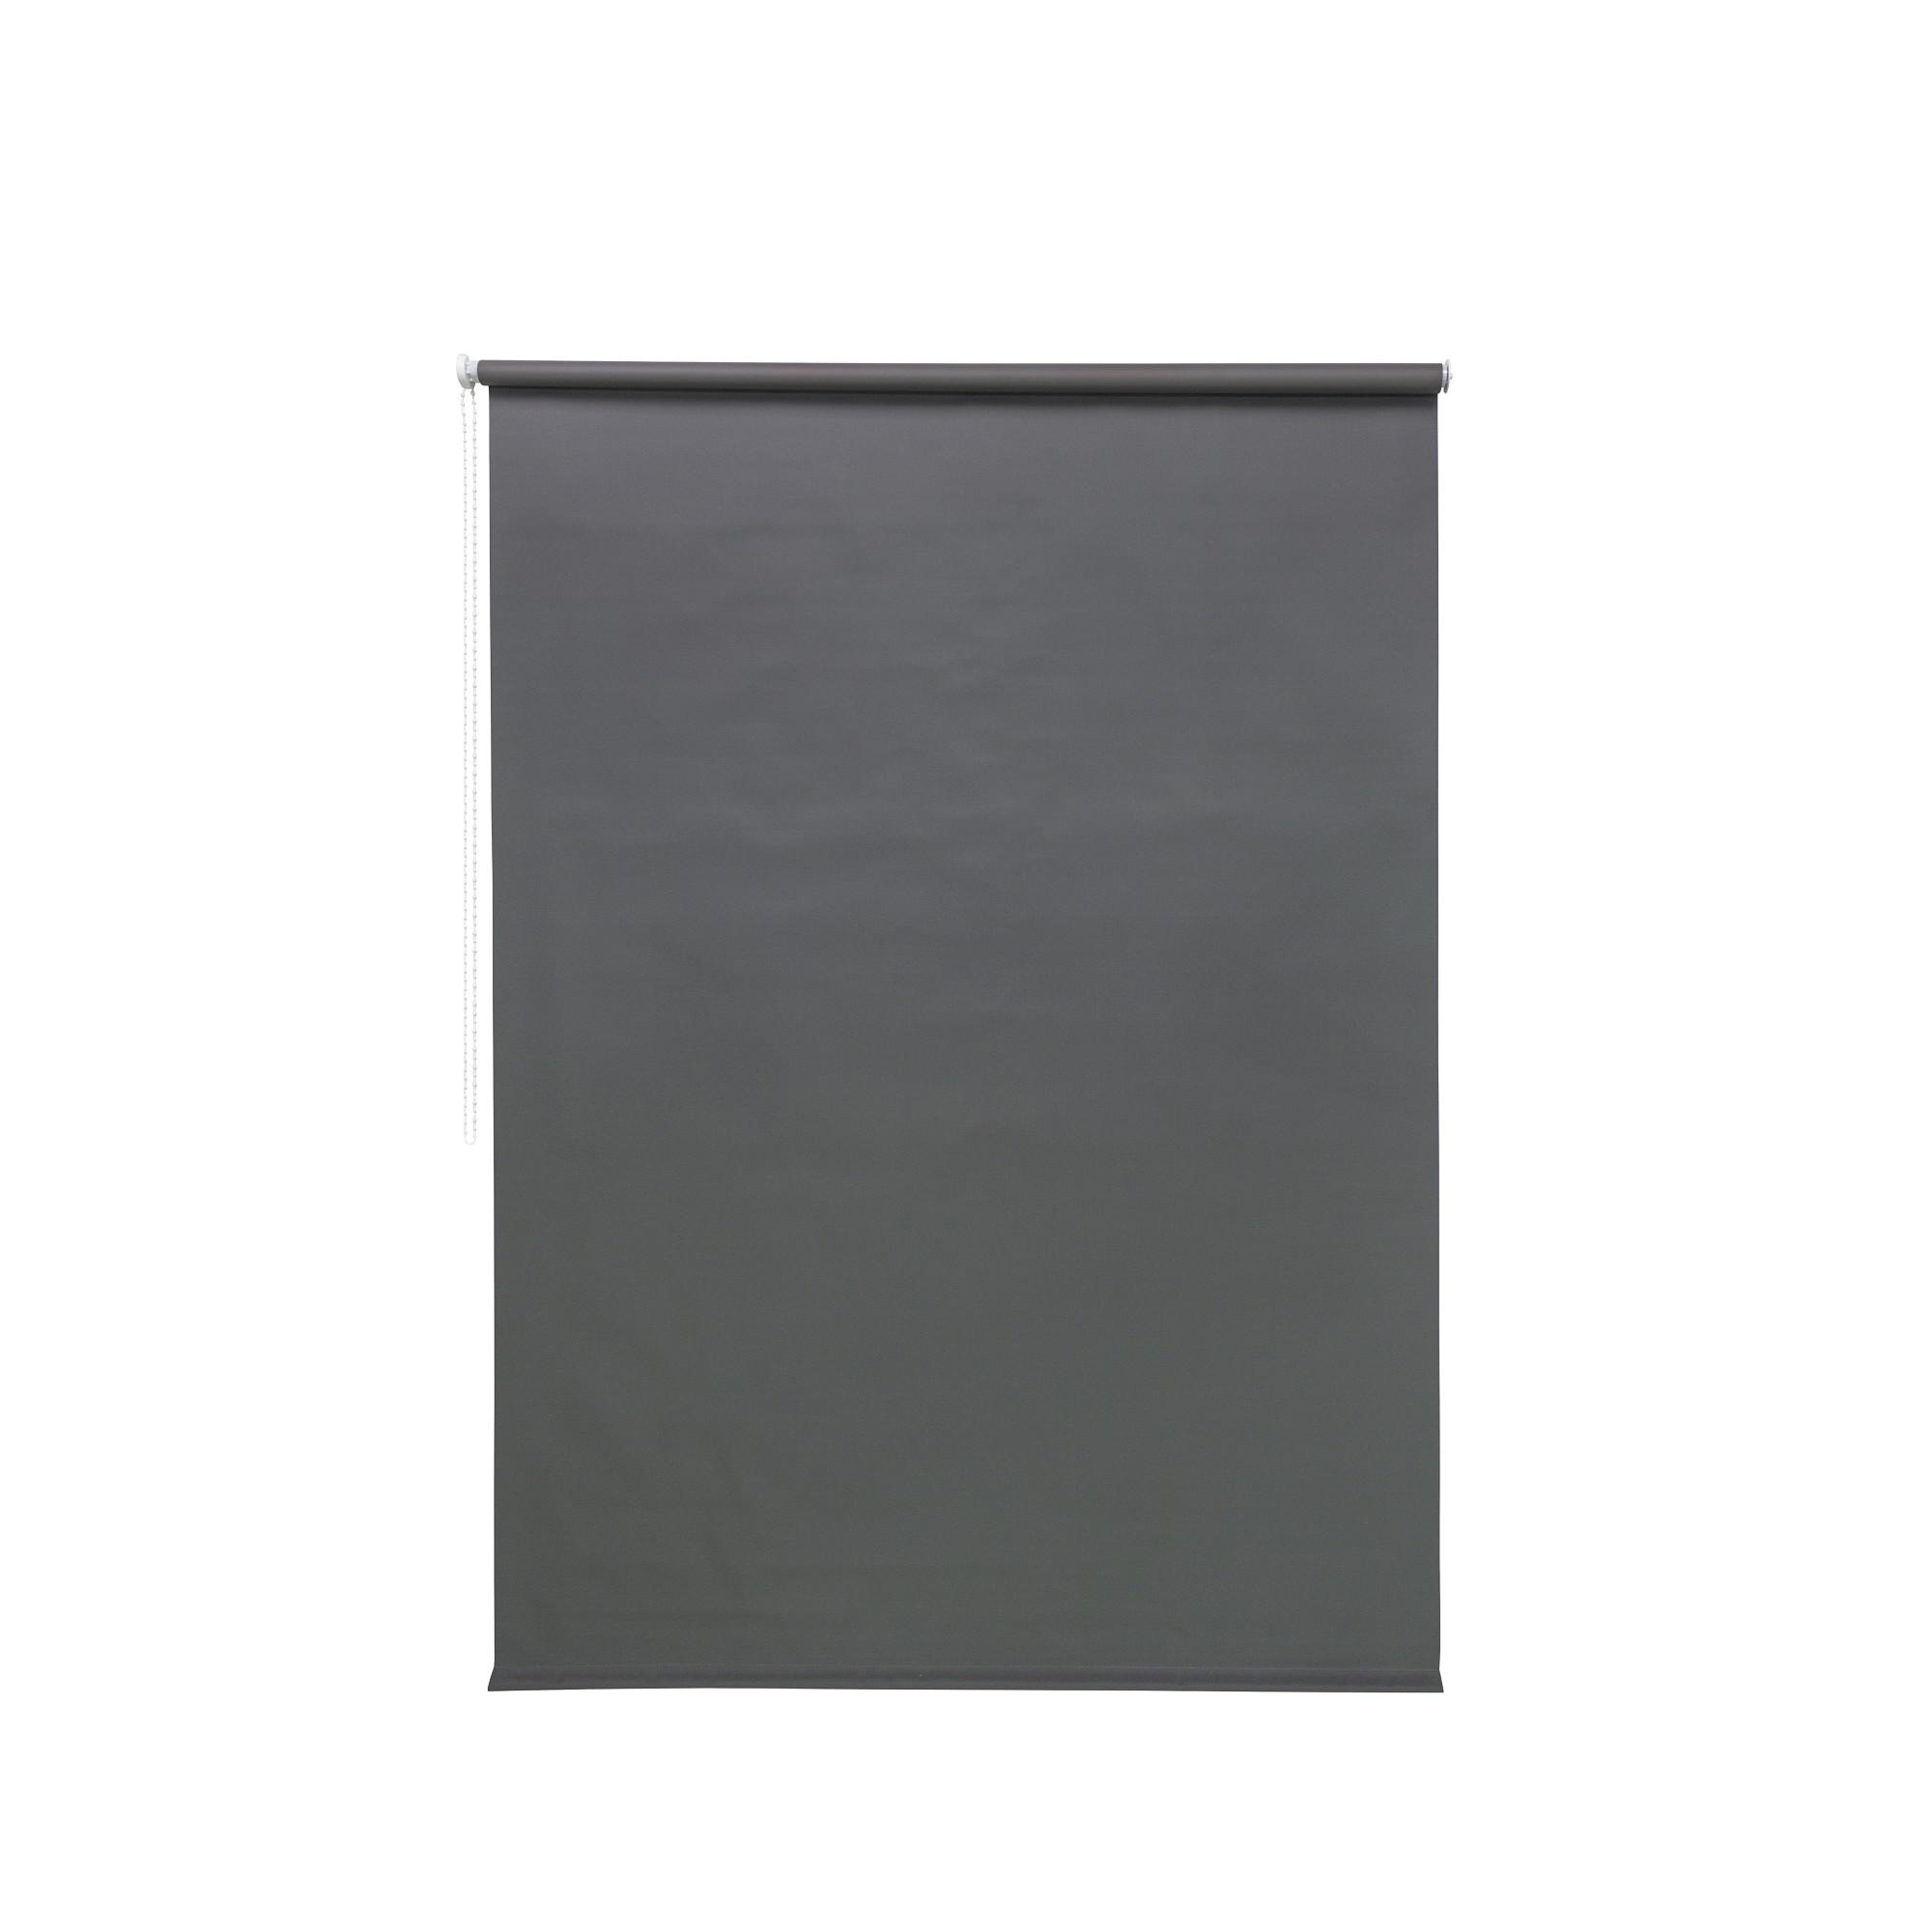 Persiana Rolo Poliester 100x170 cm Cinza D56-3 - Jolie